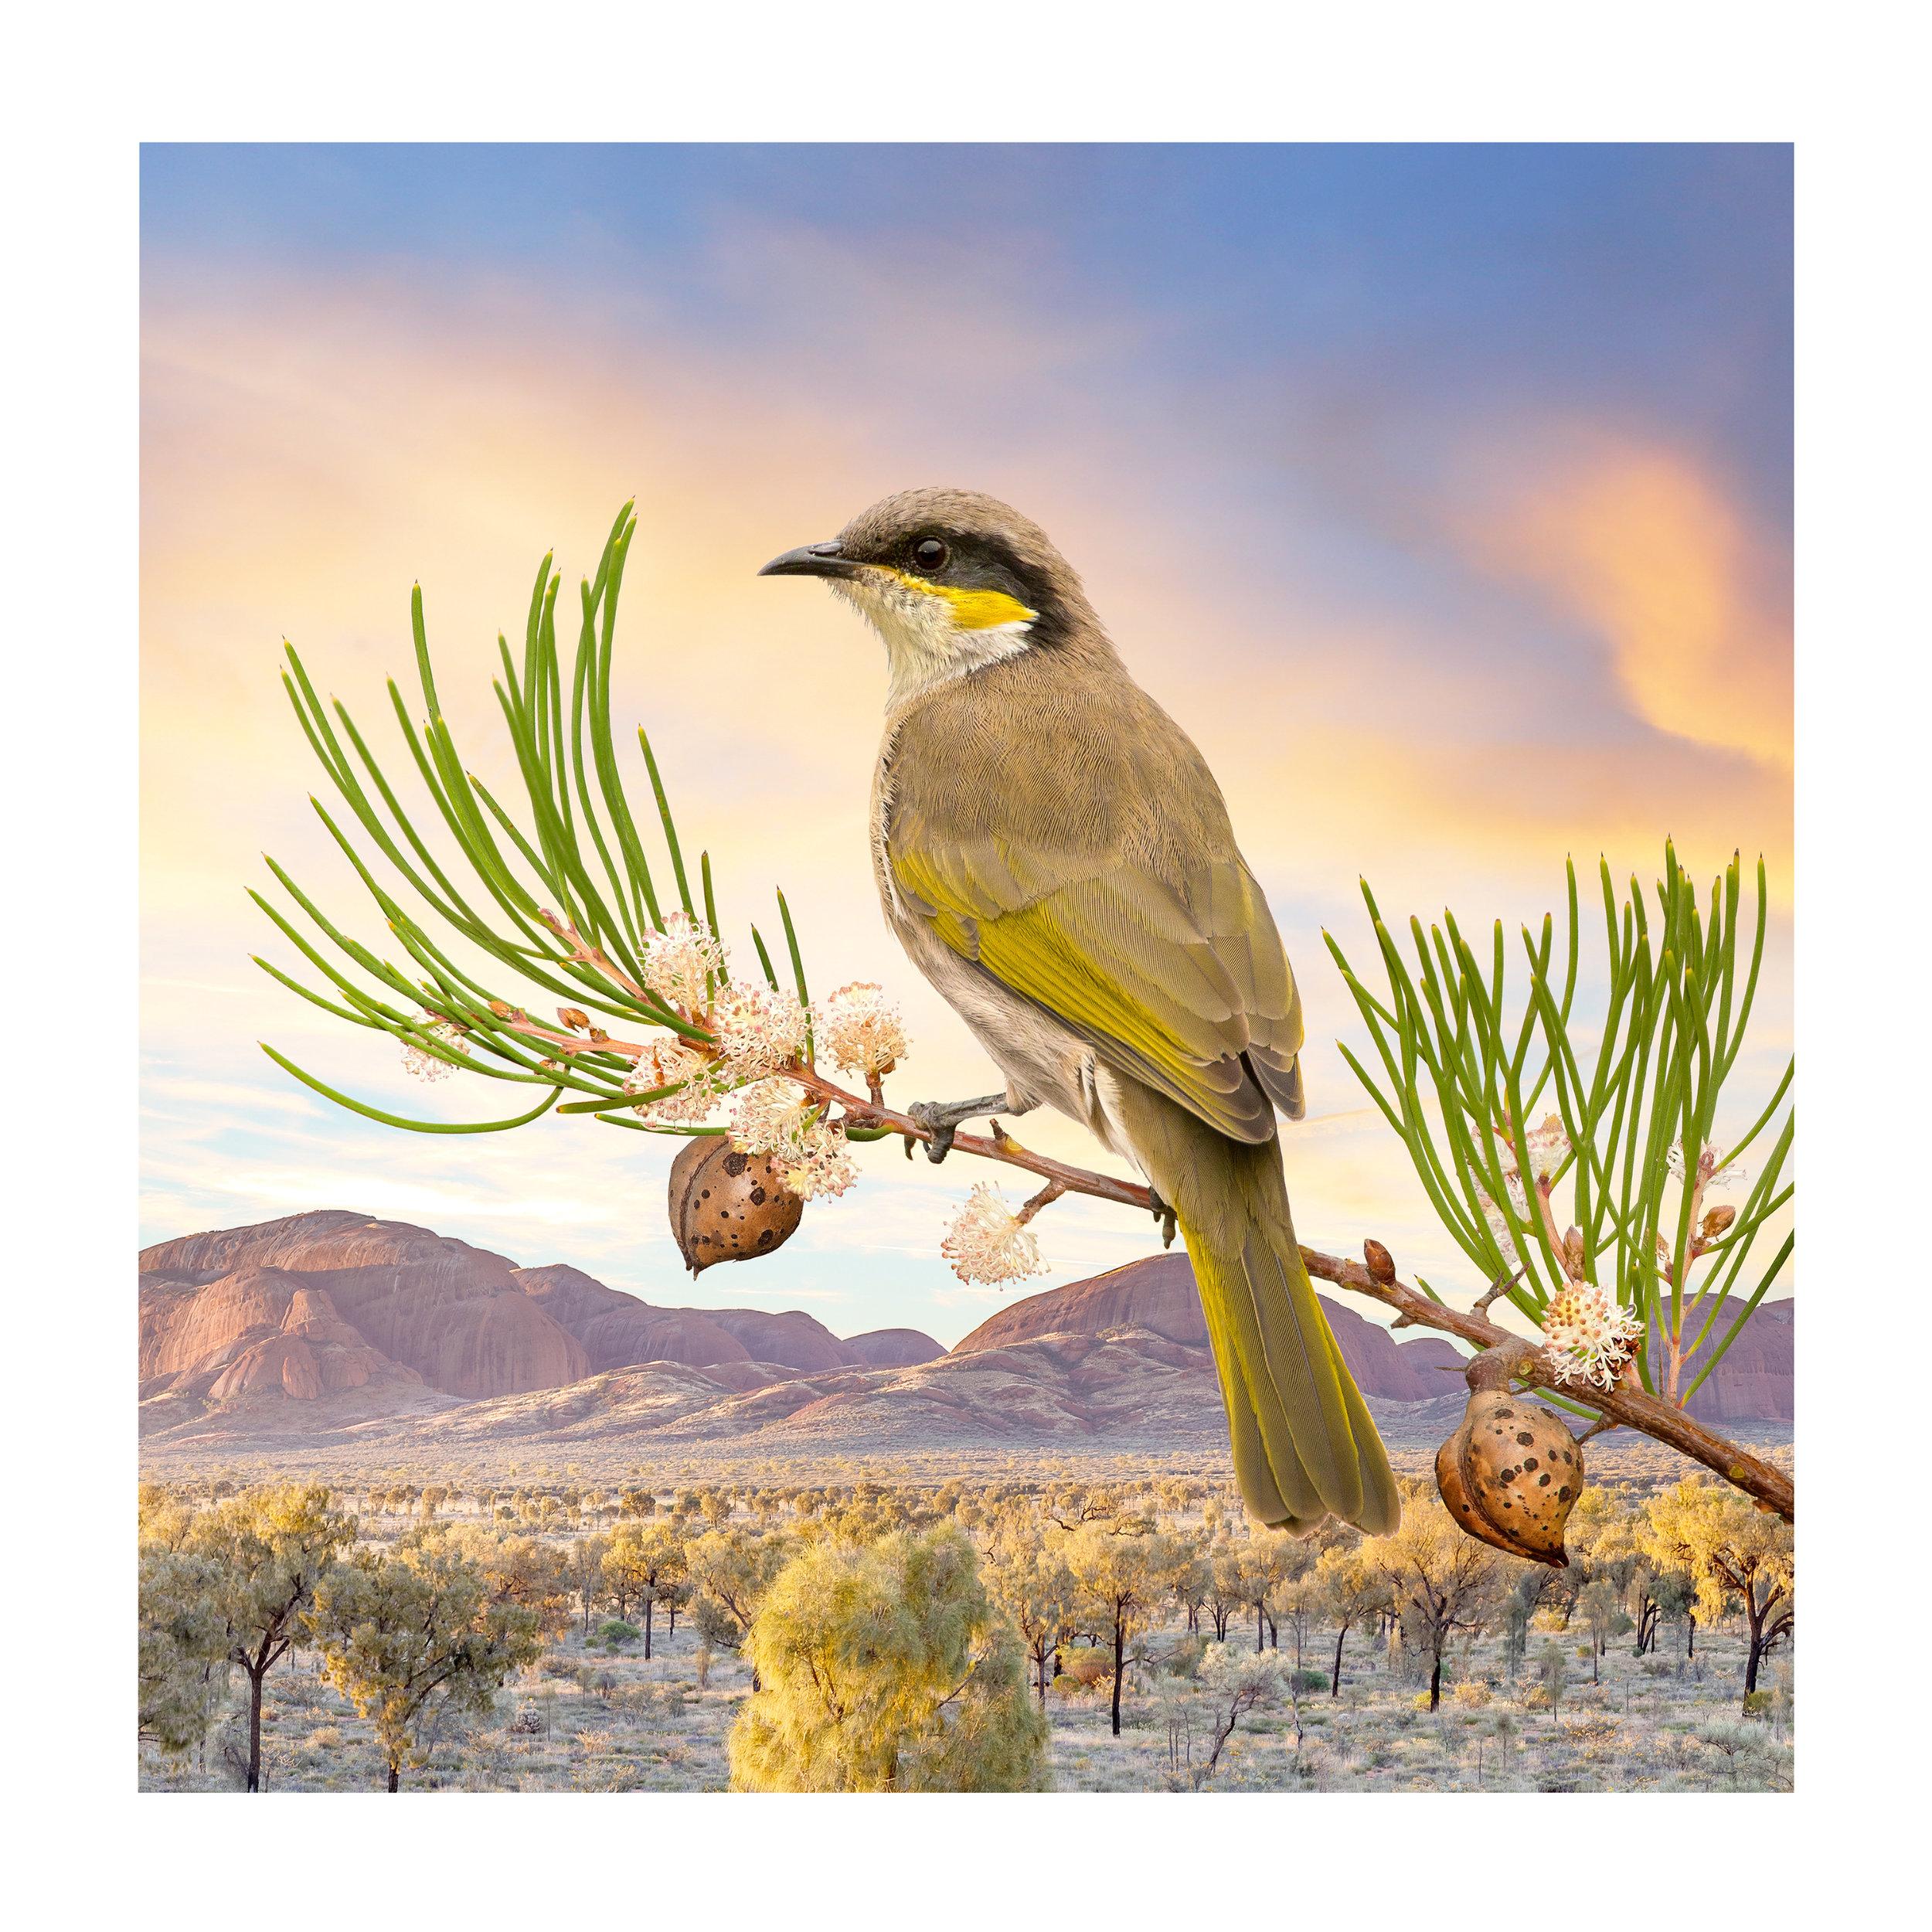 Gavicalis virescens